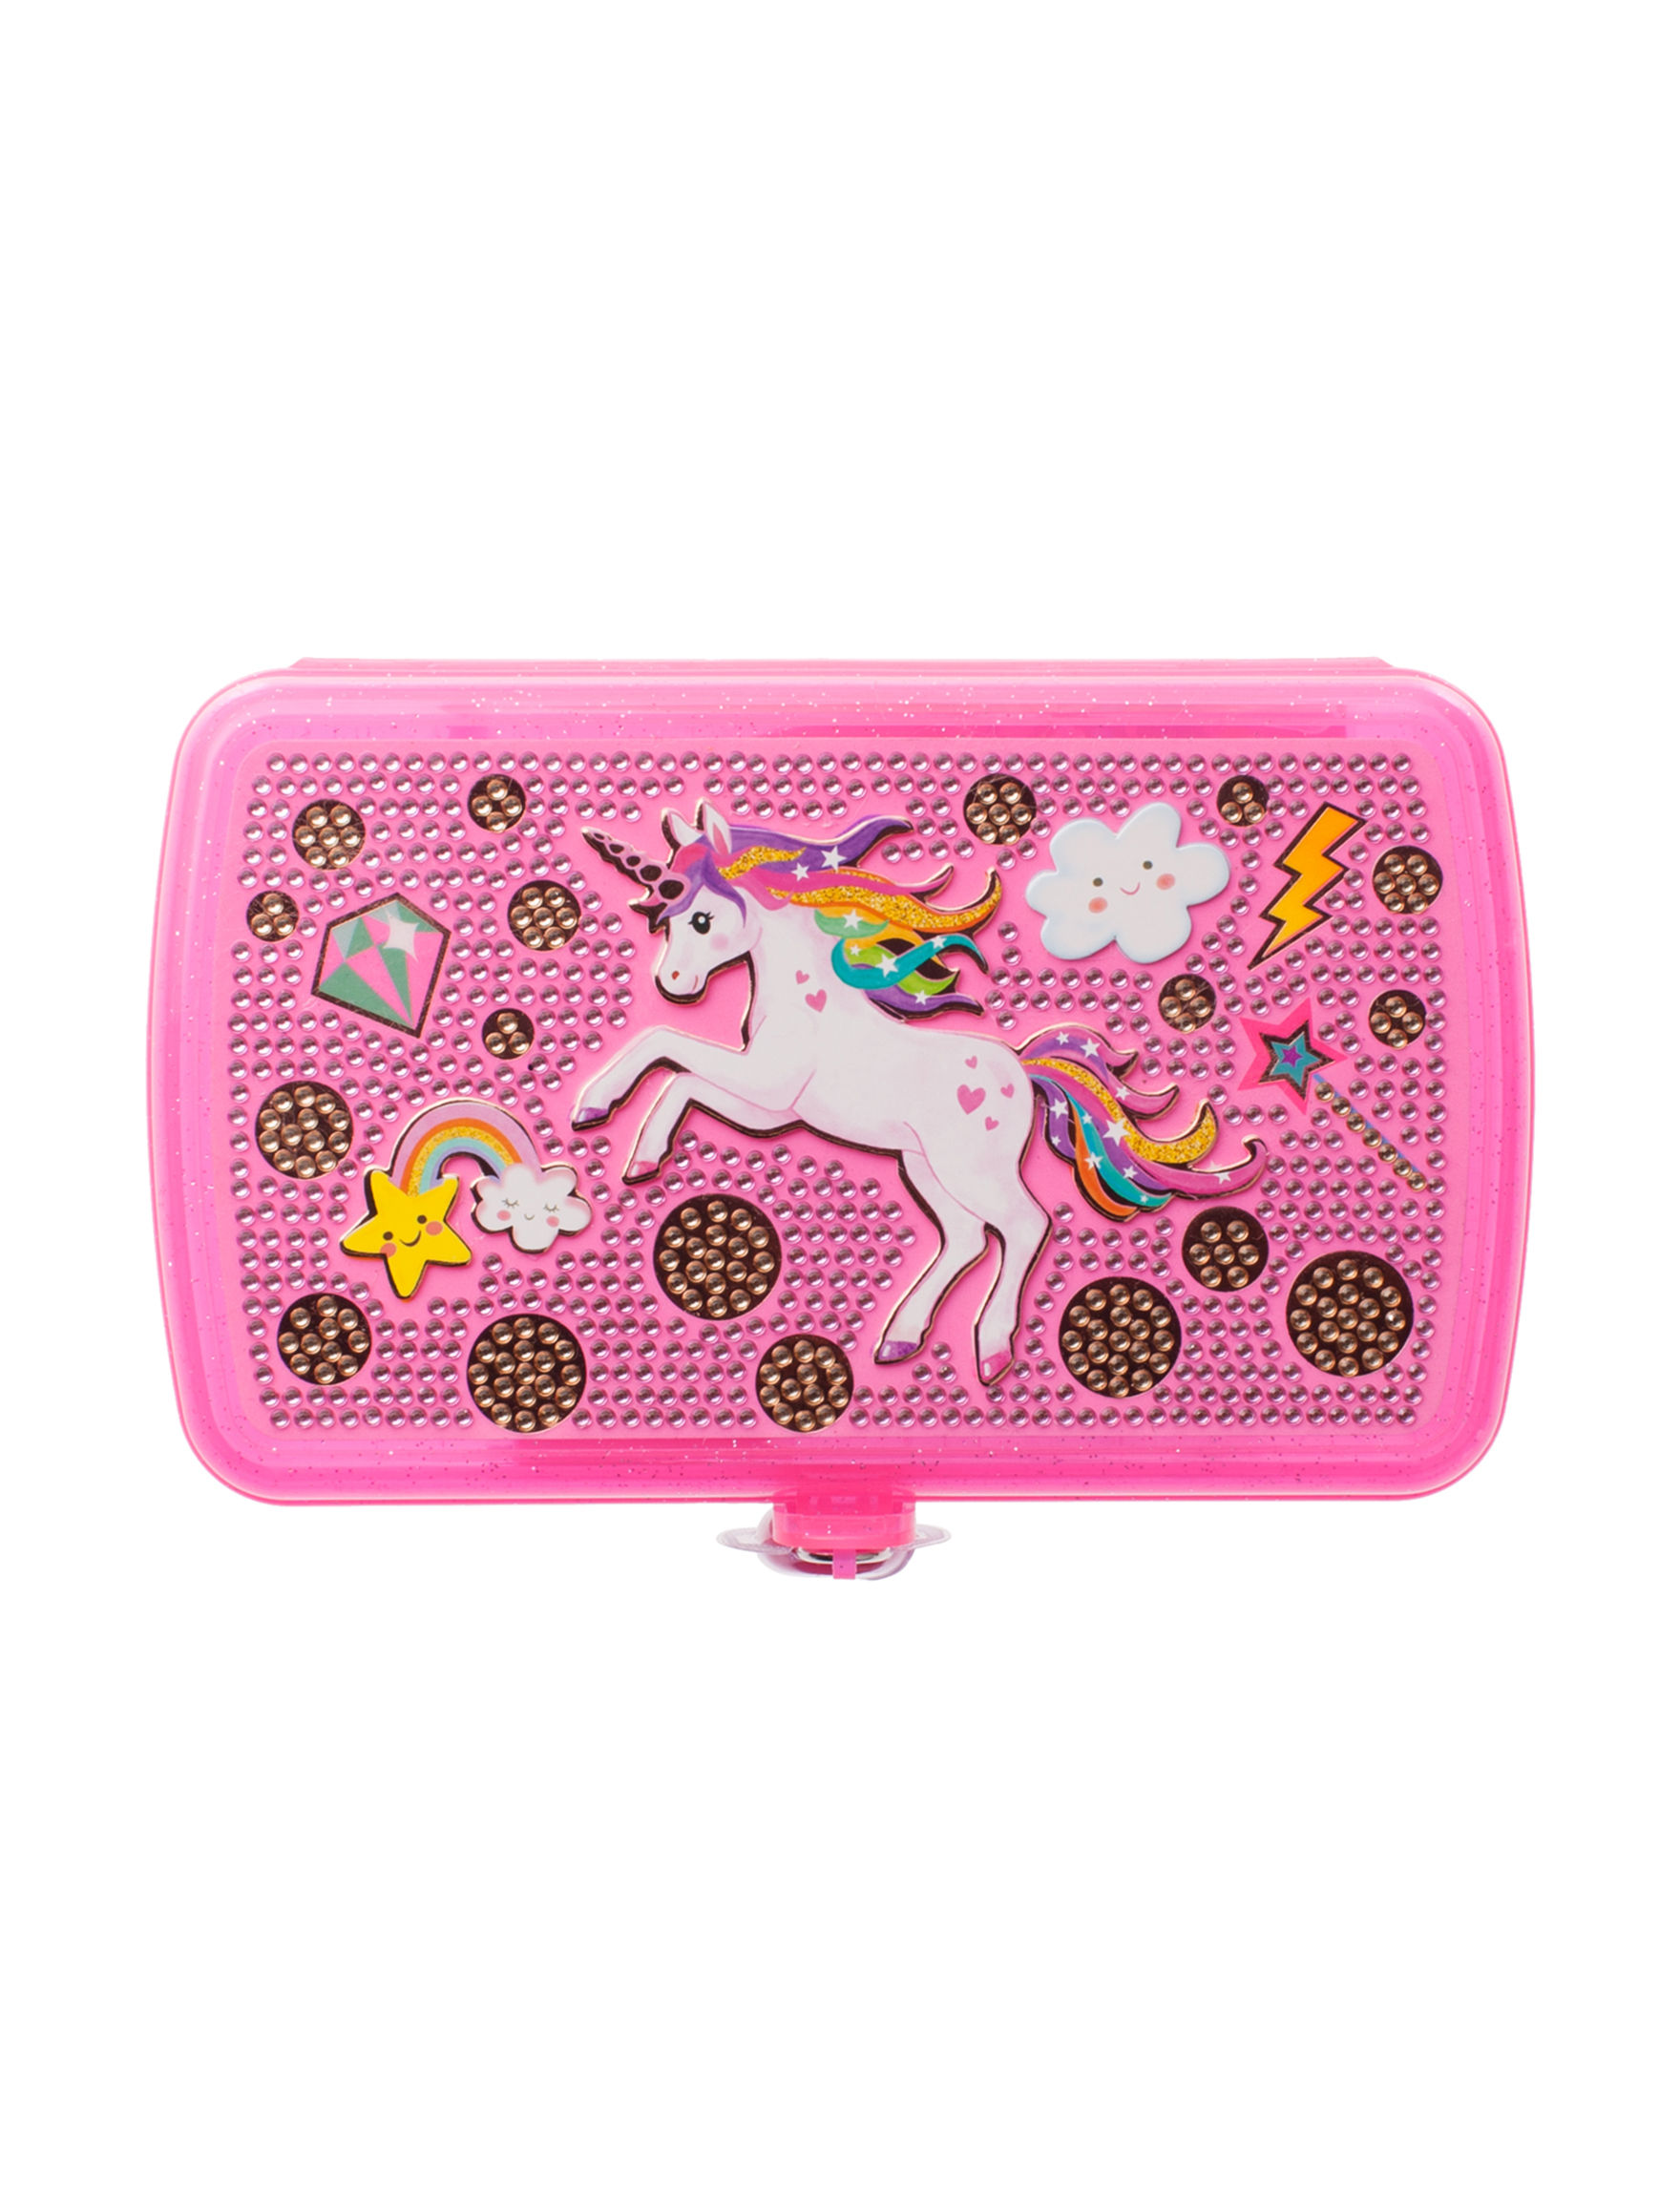 Hot Focus Pink School & Office Supplies